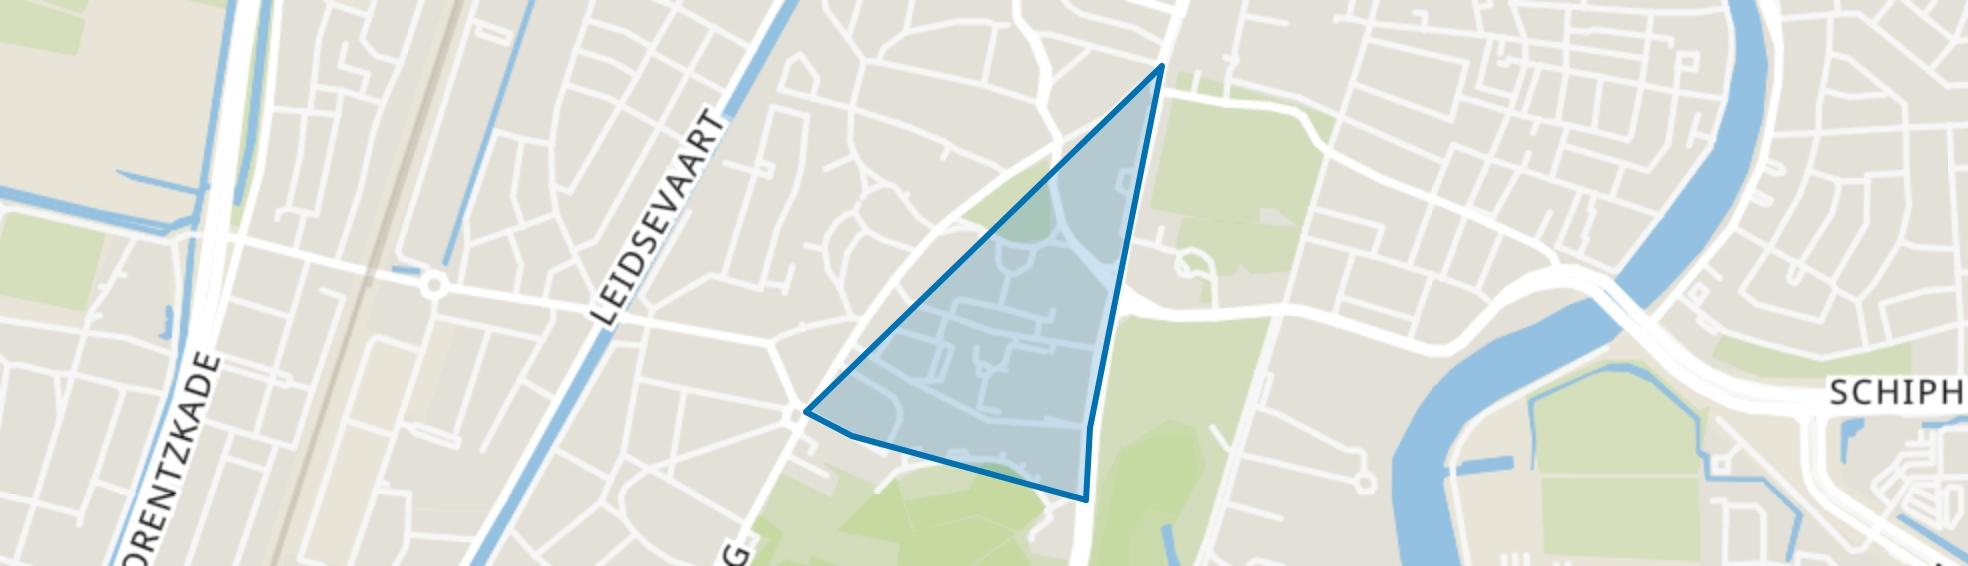 Florapark, Haarlem map